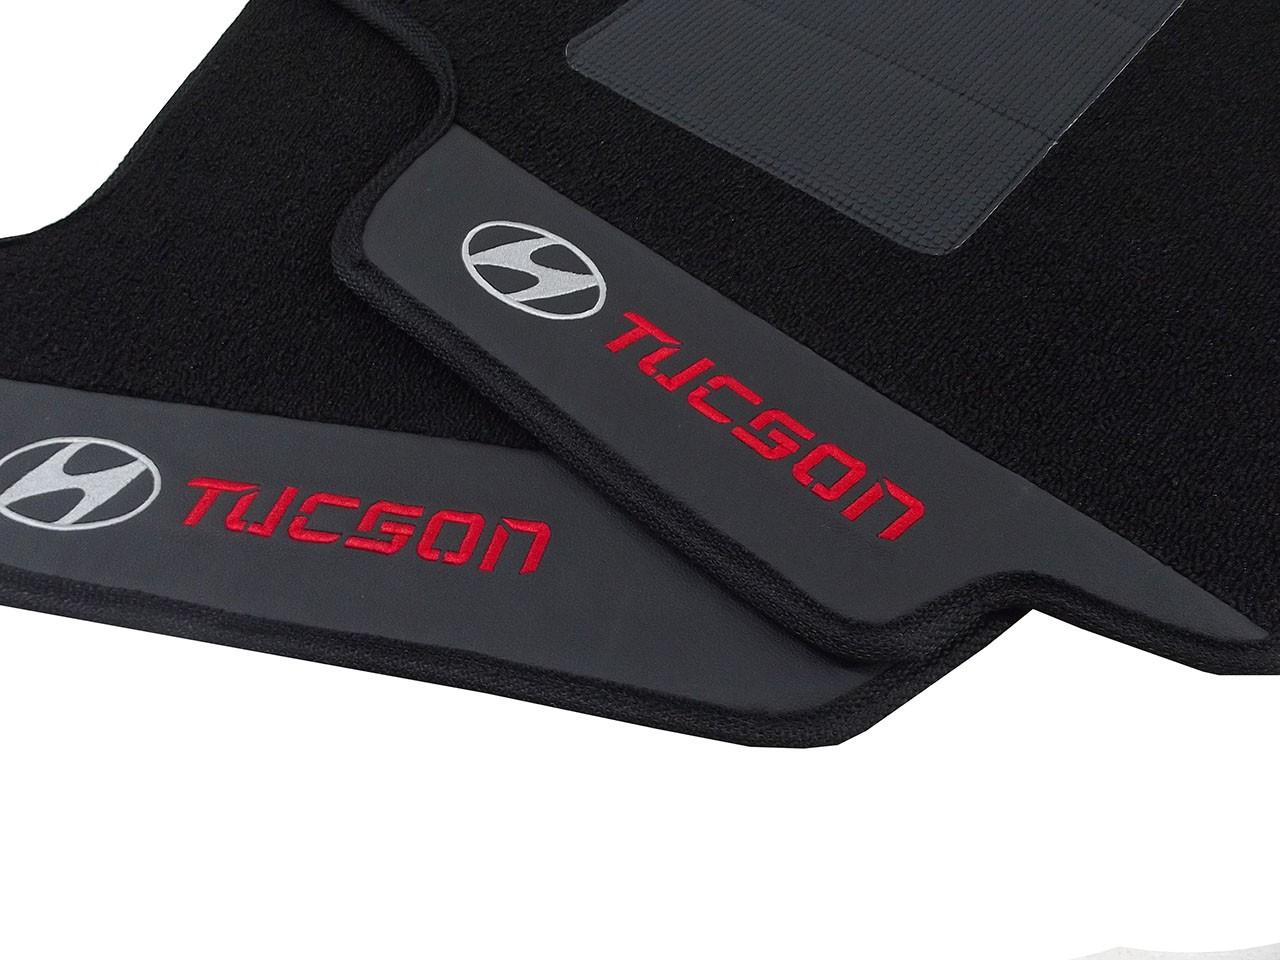 Tapete Original Hyundai Tucson Carpete Luxo Base Borracha Hitto